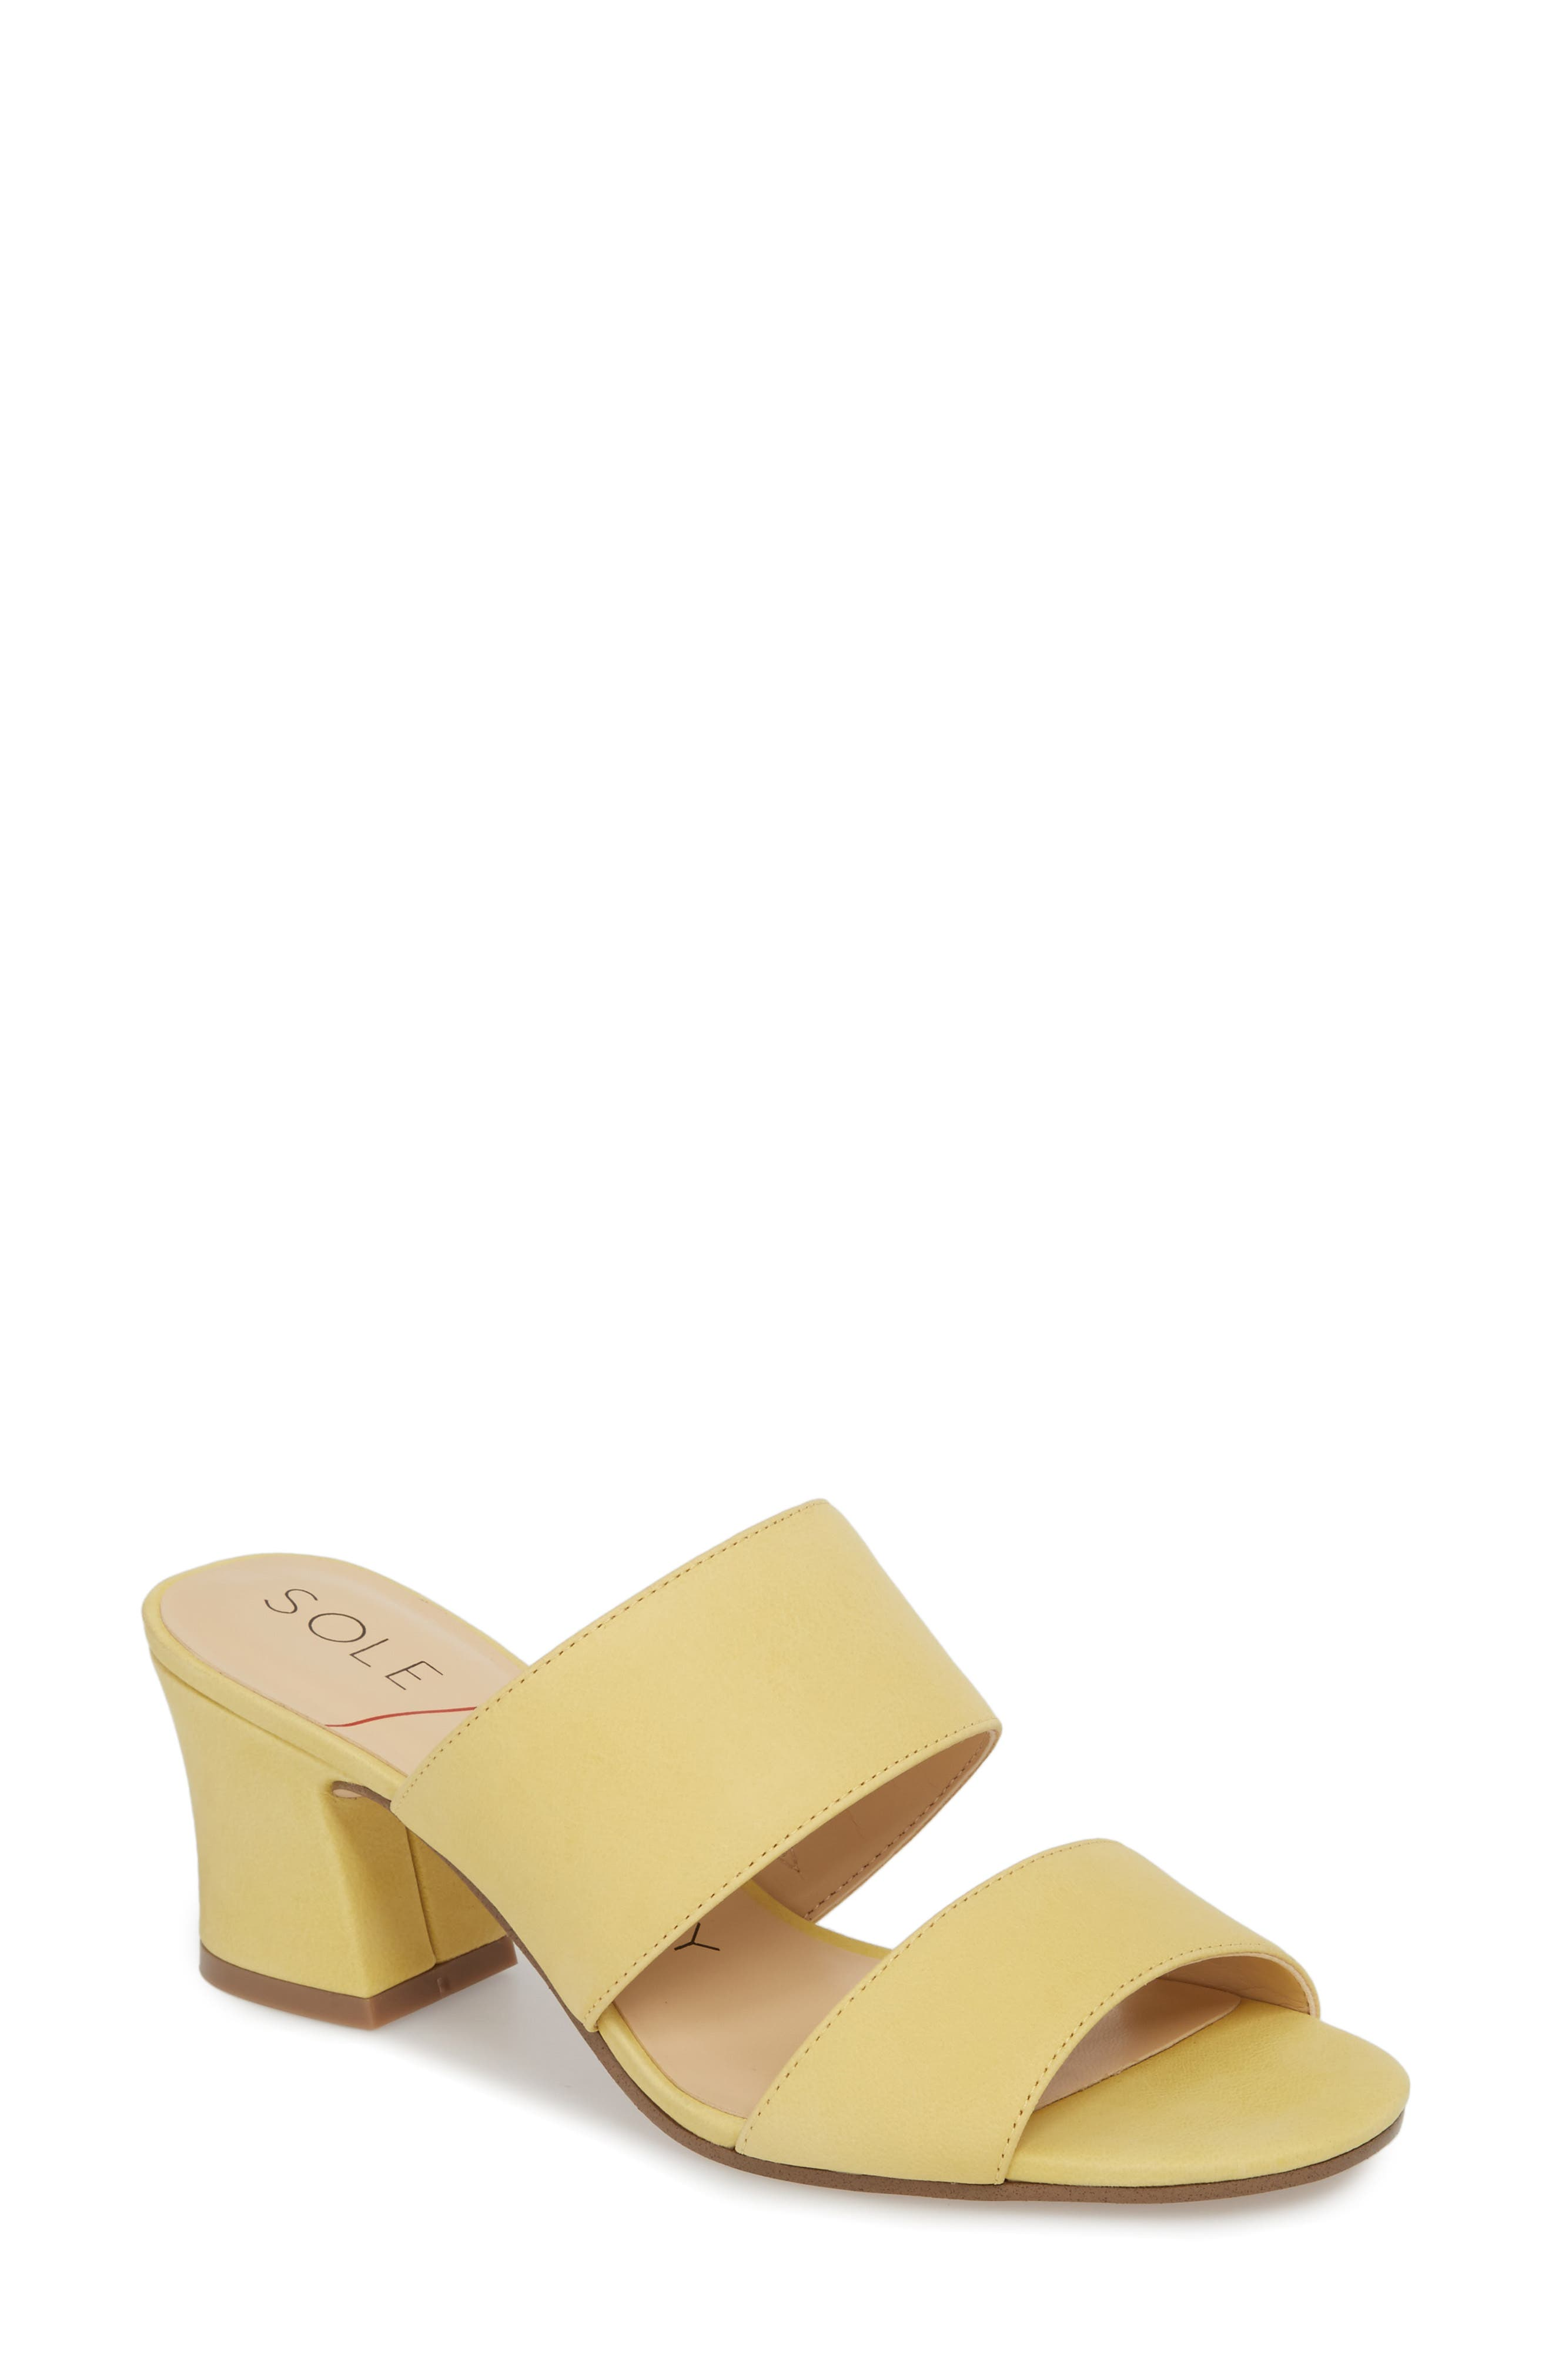 Sole Society Heline Slide Sandal, Yellow